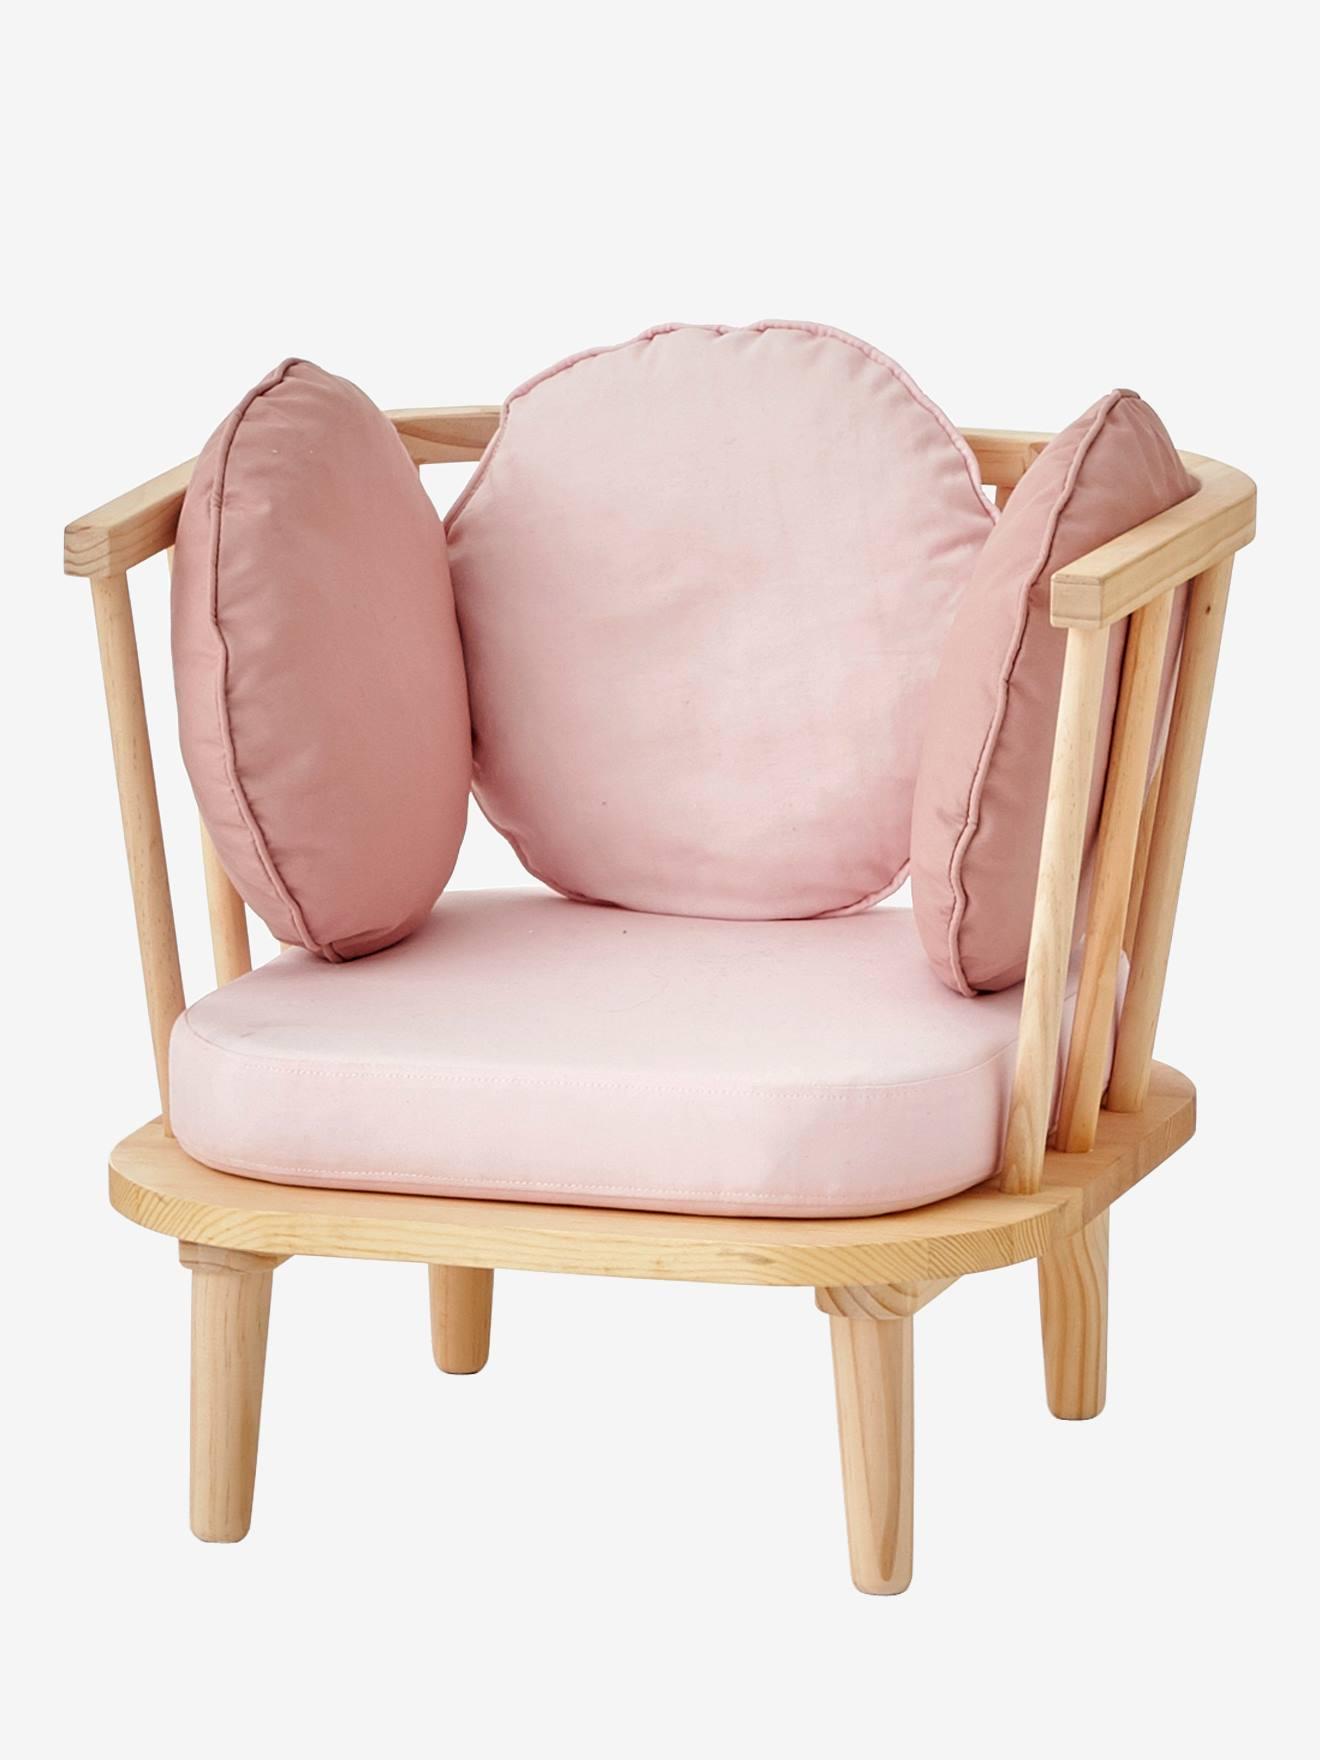 VERTBAUDET Retro-Sessel für Kinderzimmer rosa